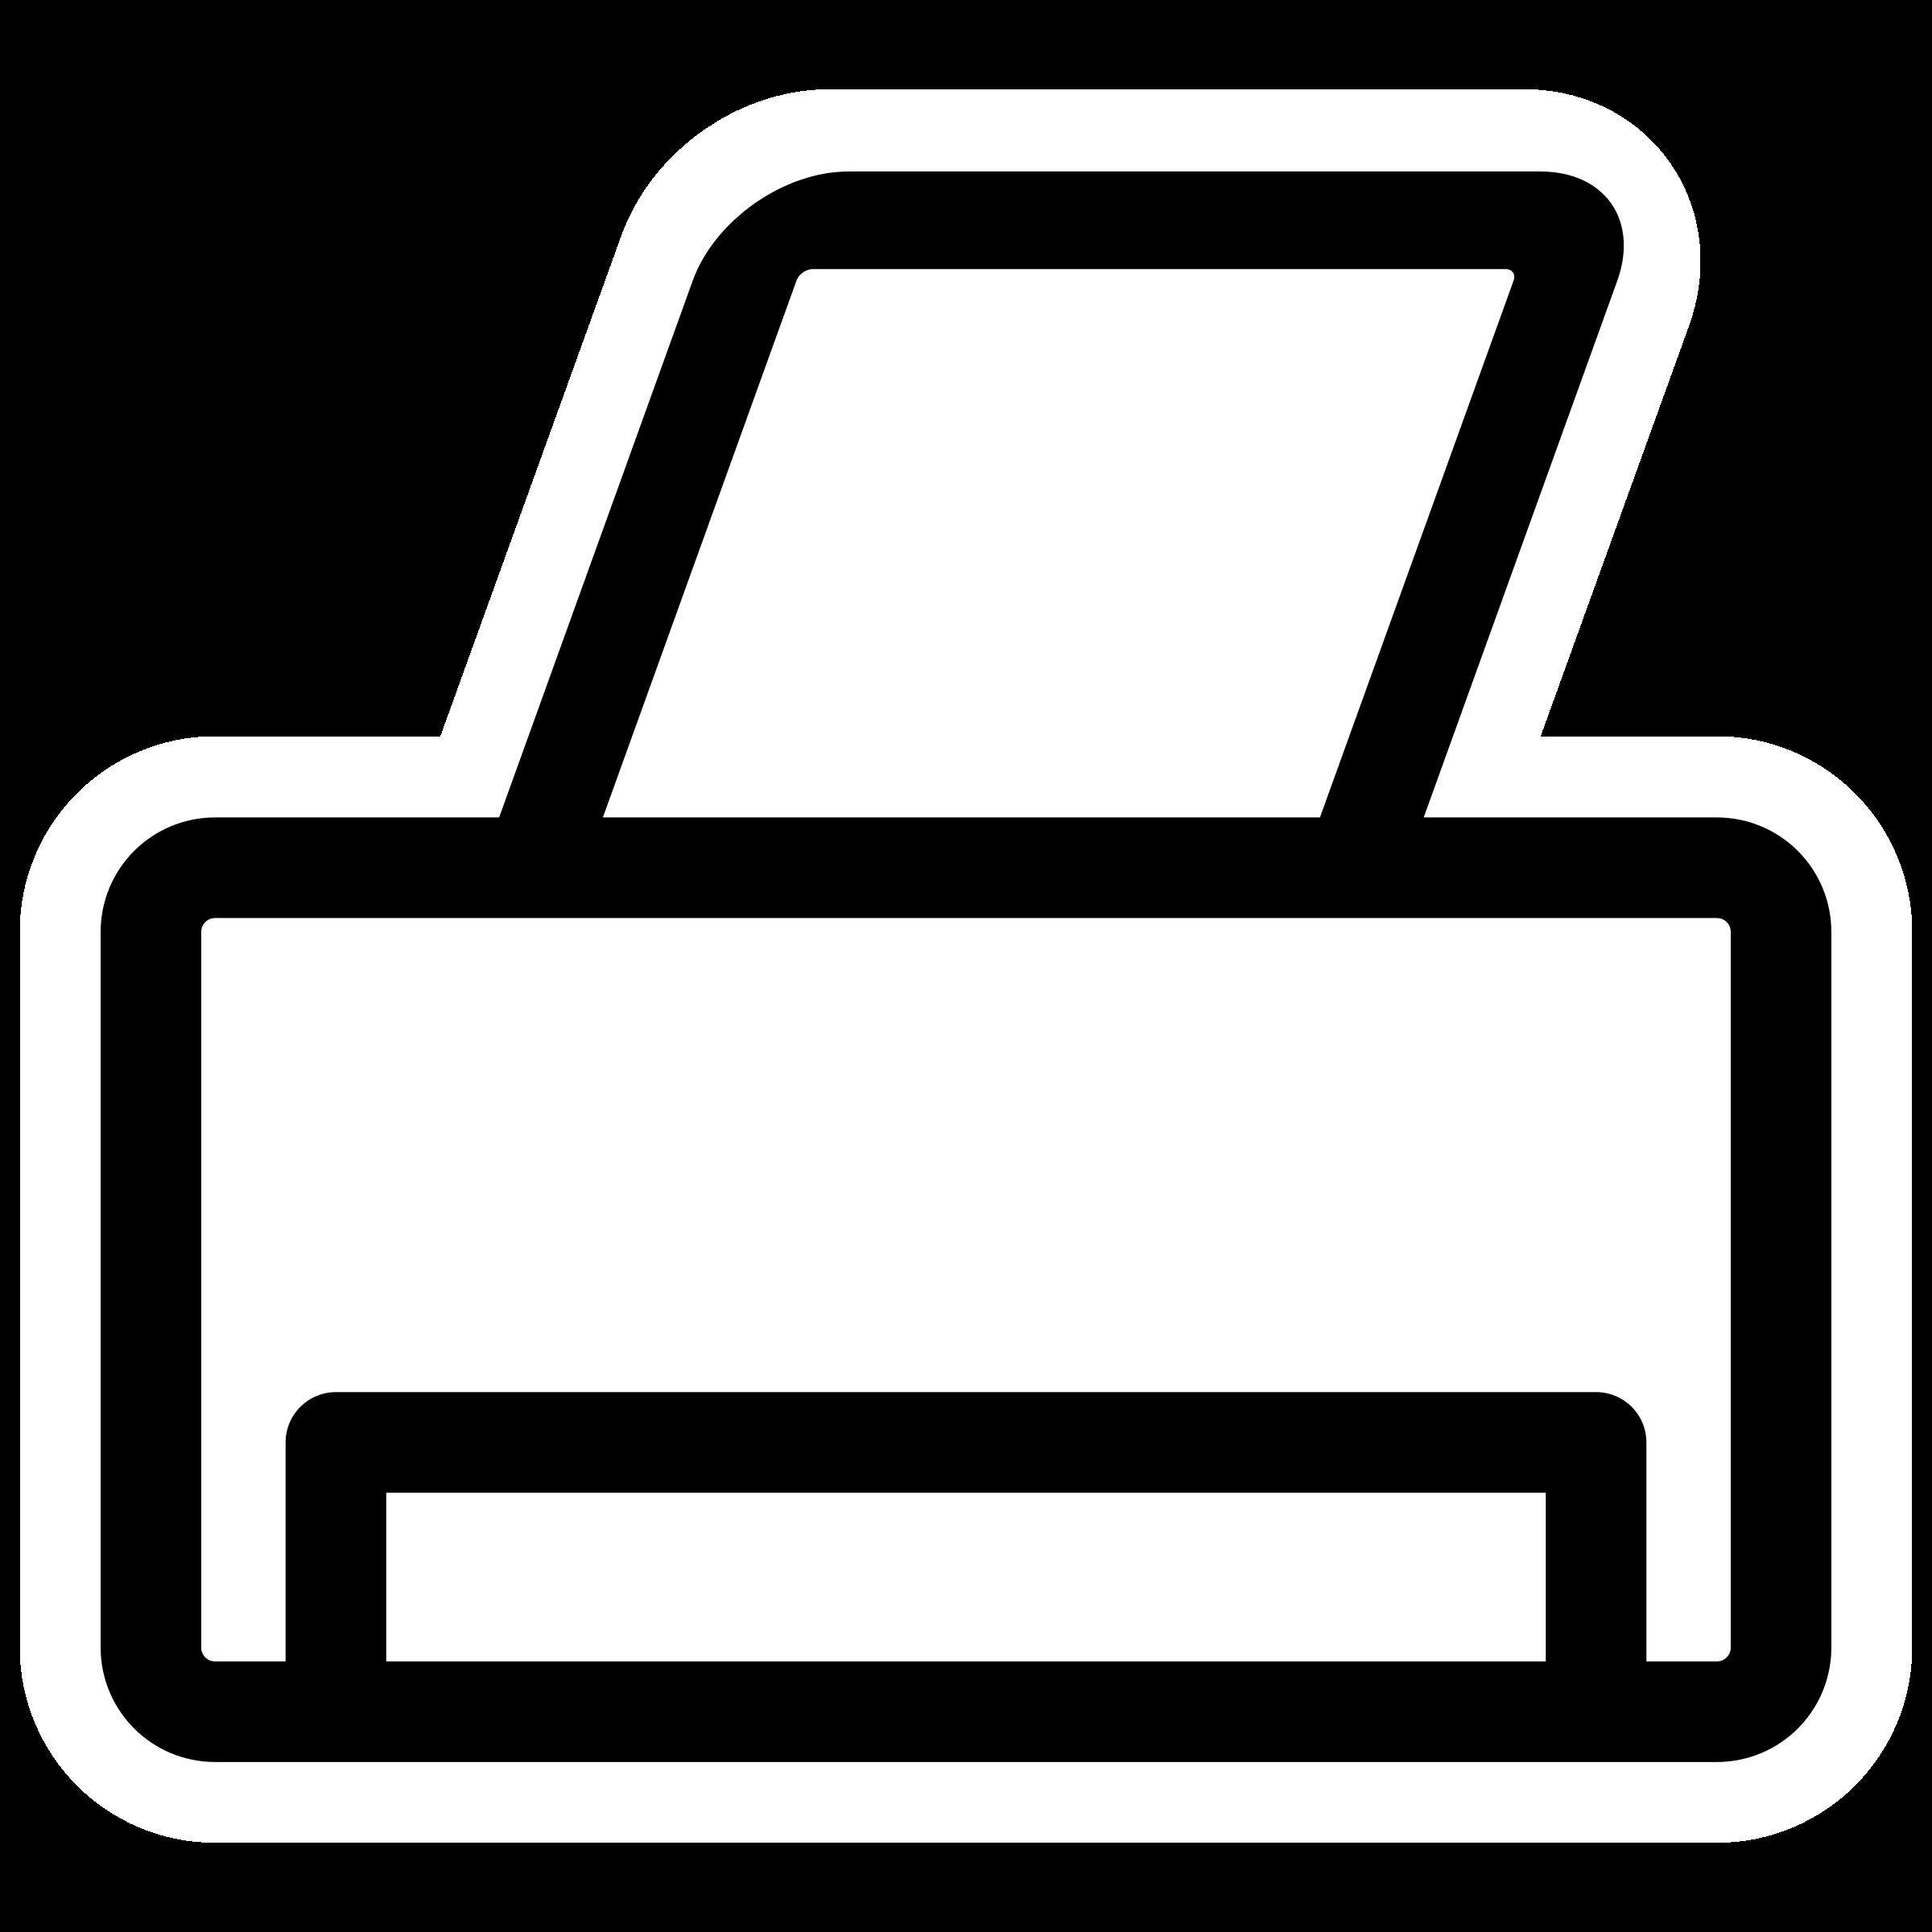 Printer Clipart.